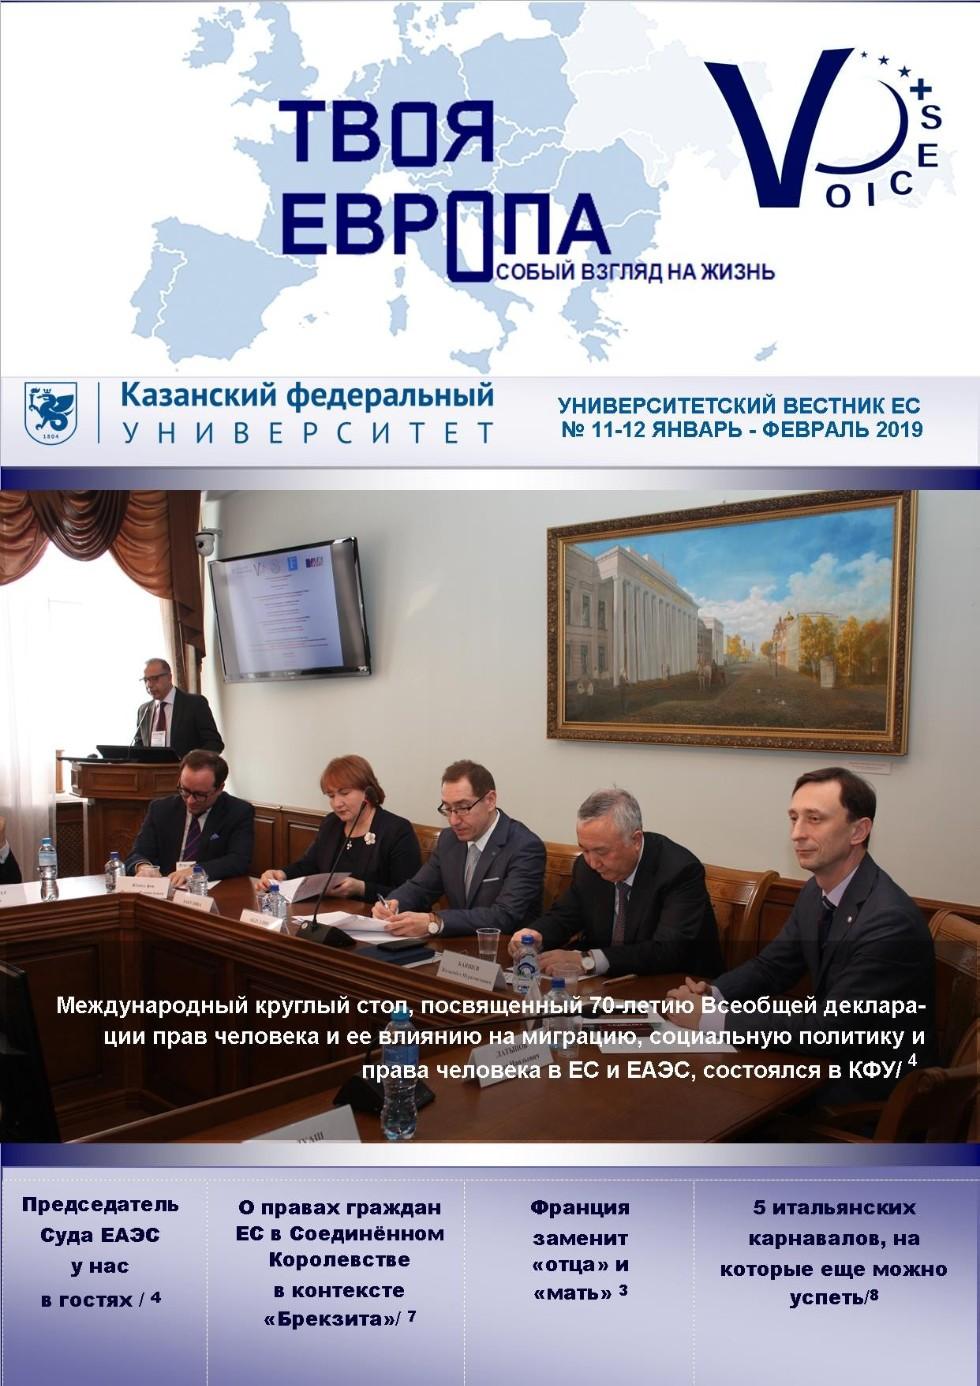 Университетский вестник Центра ЕС 'Твоя Европа' ,Твоя Европа, Voices+, Евроклуб